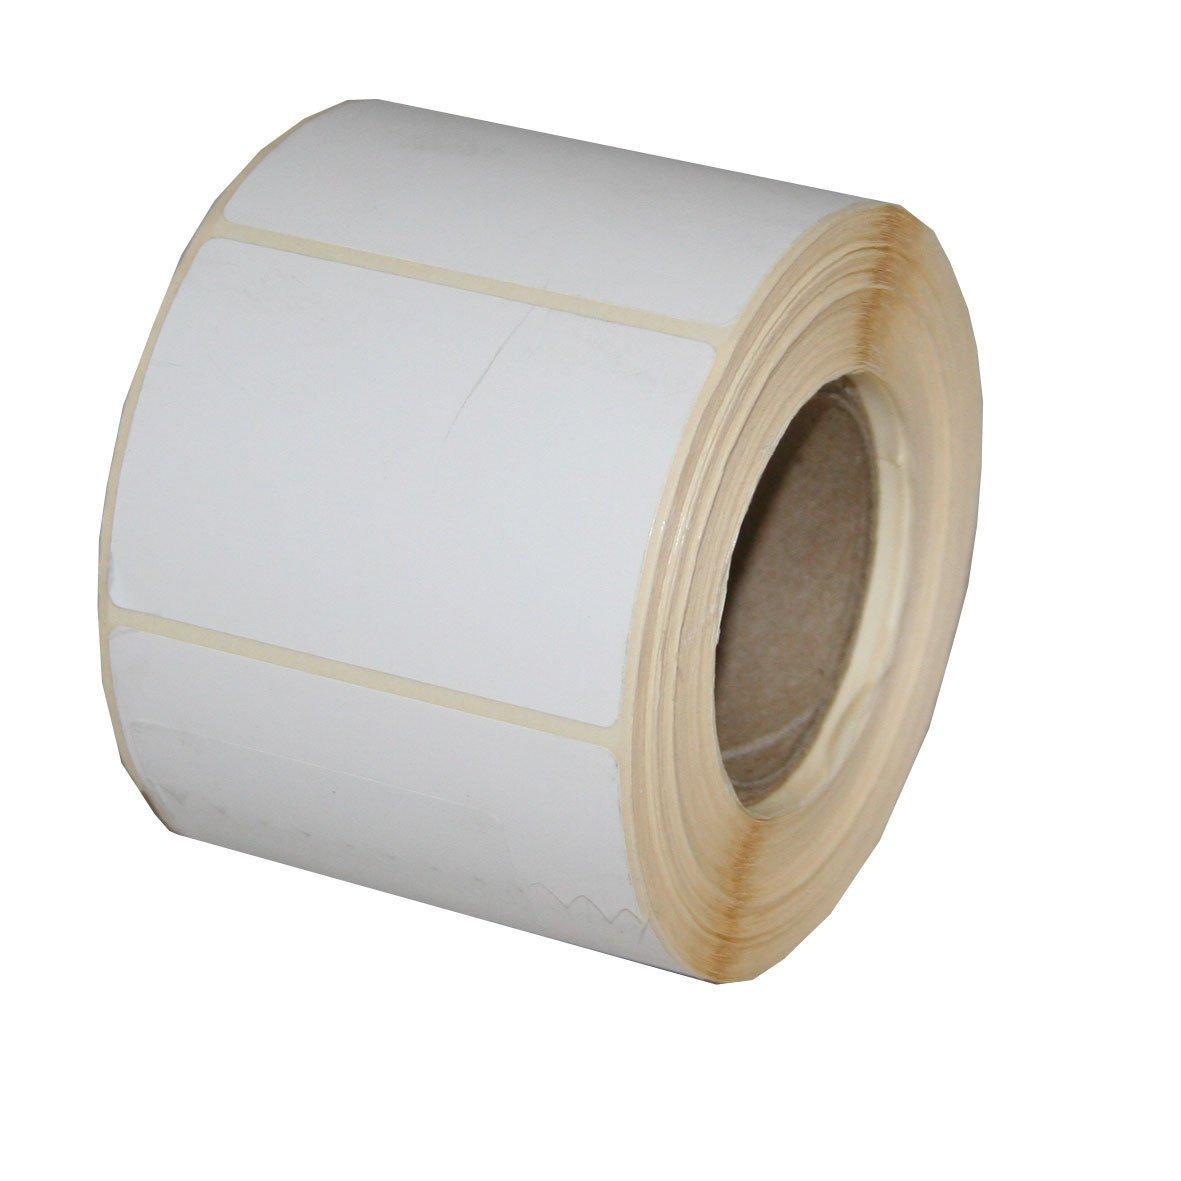 Весовая лента 58х40 мм, ЭКО В белая термо бумага, (непринт)